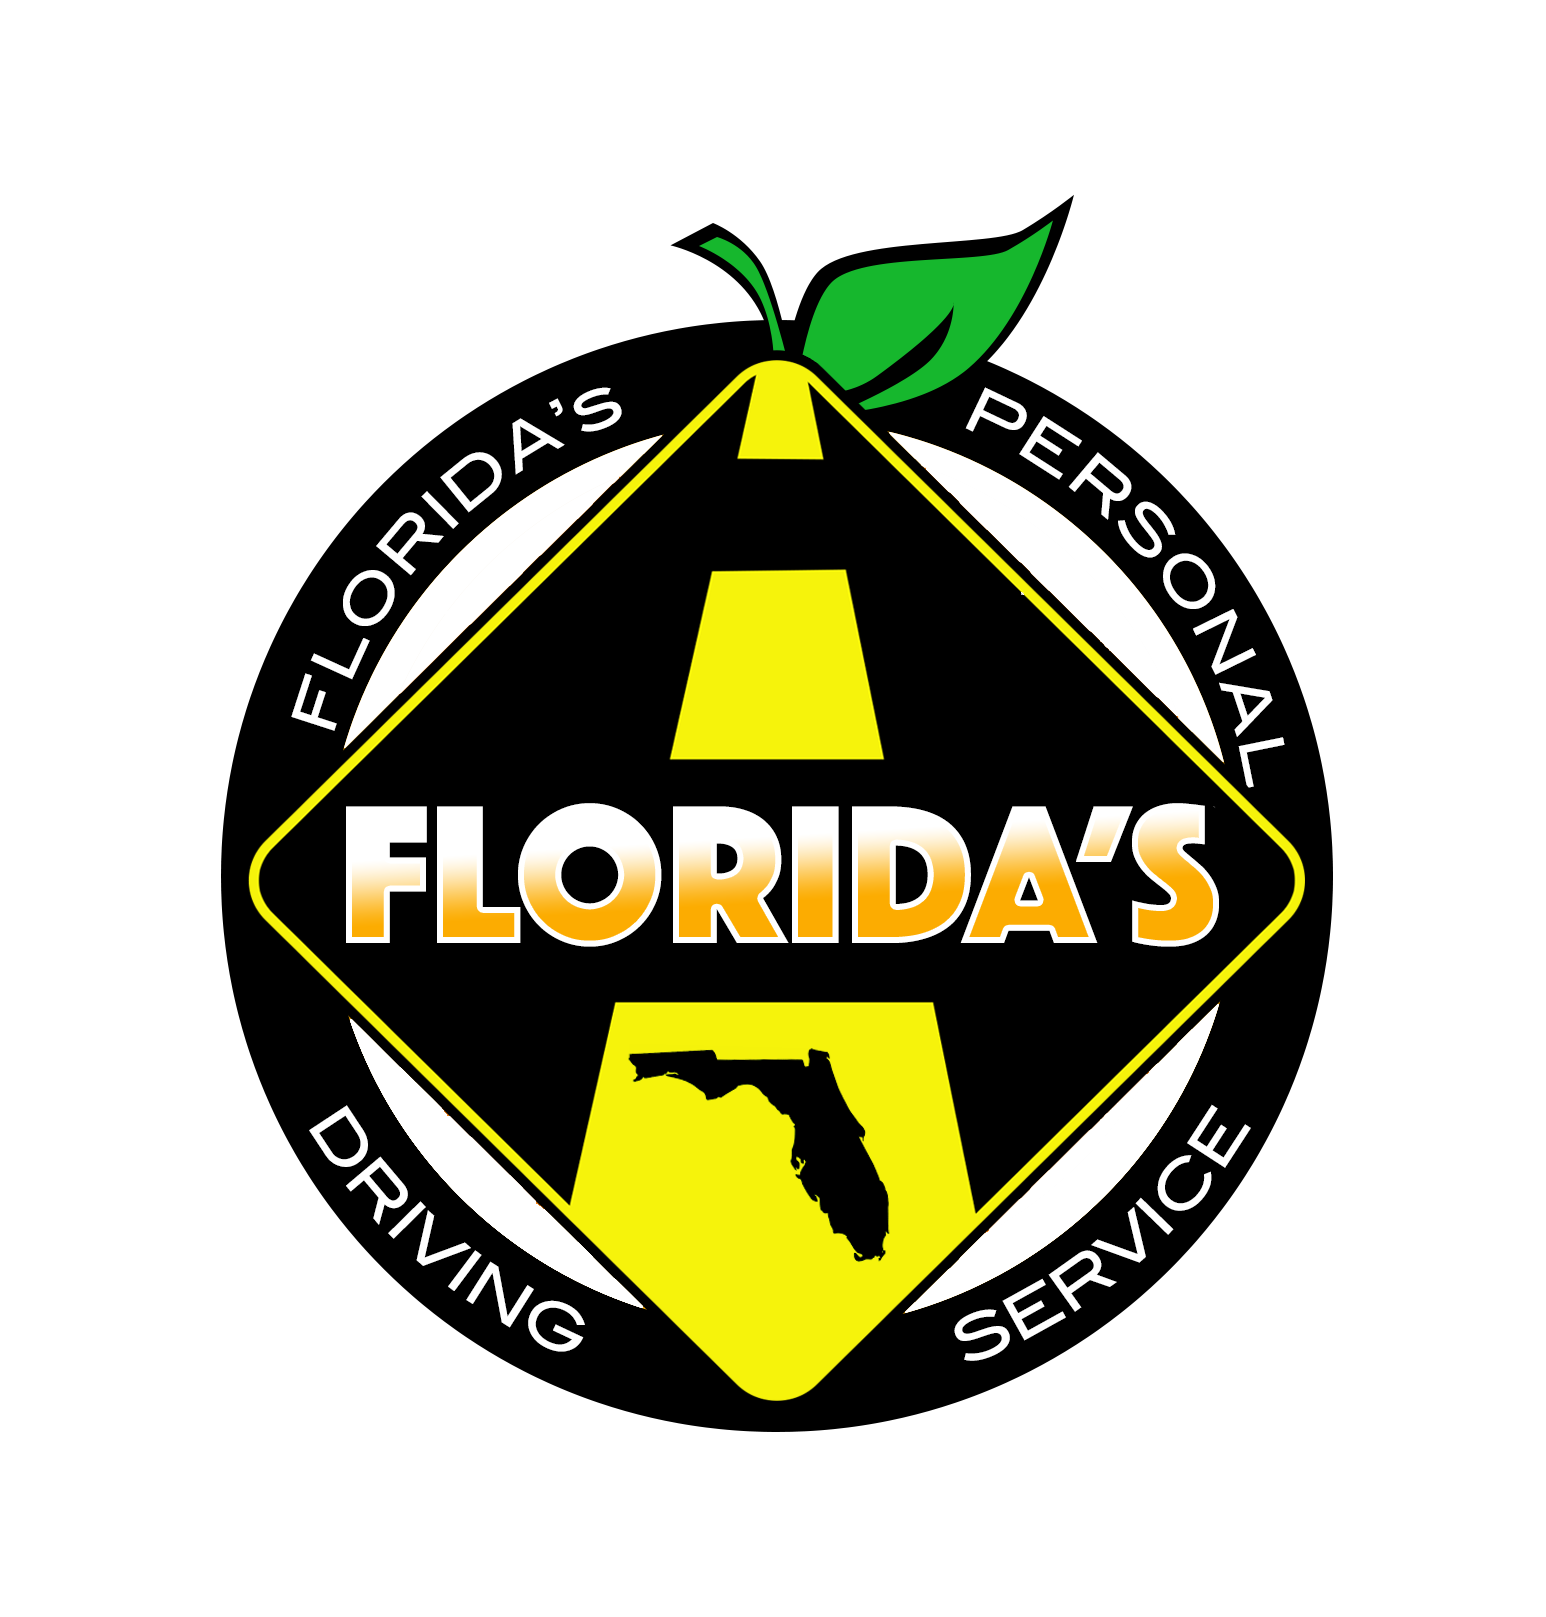 FLORIDA'S